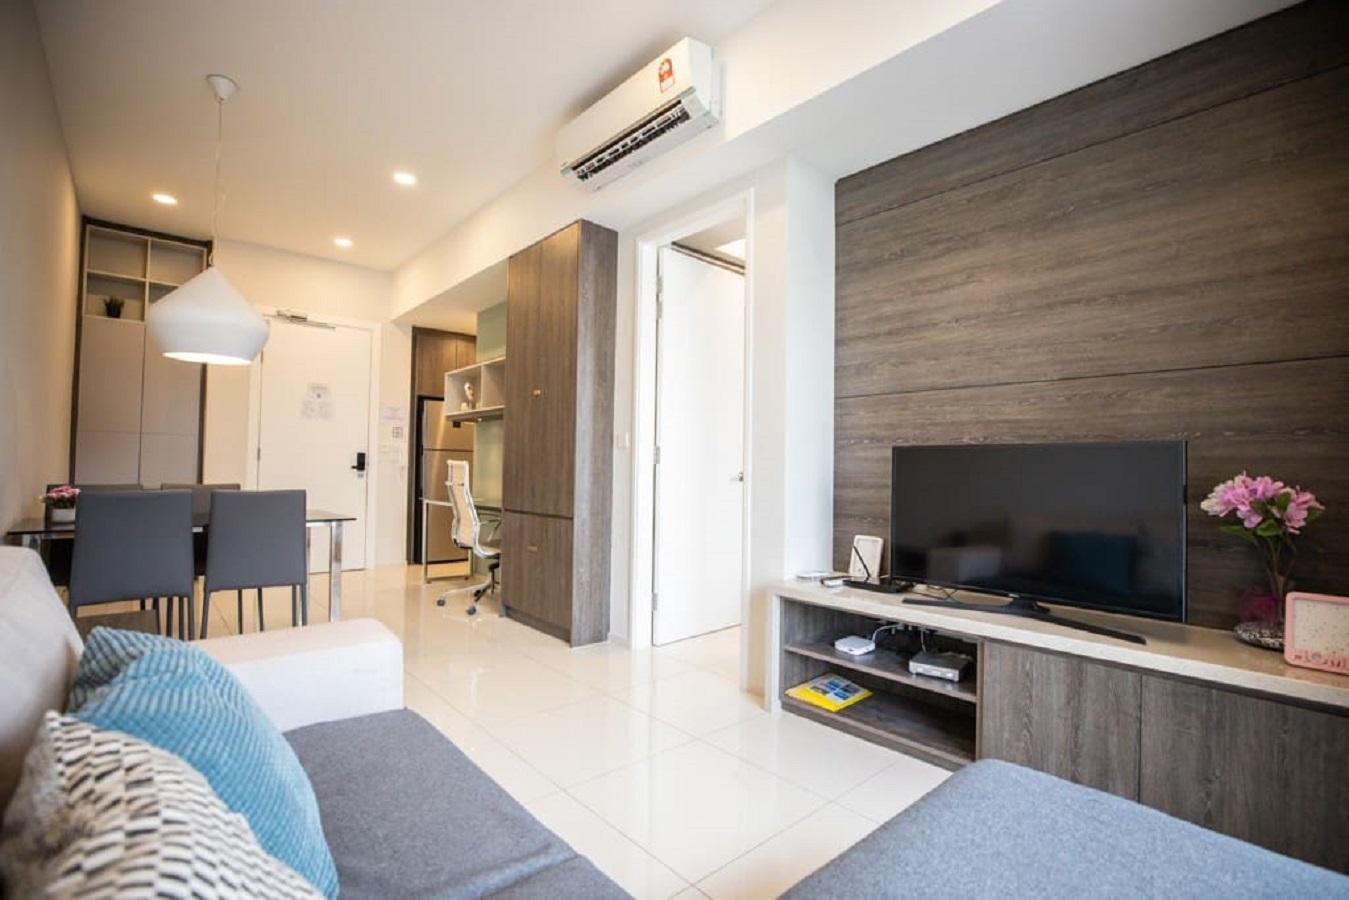 Maxhome@Robertson Residence KL Bukit Bintang 91